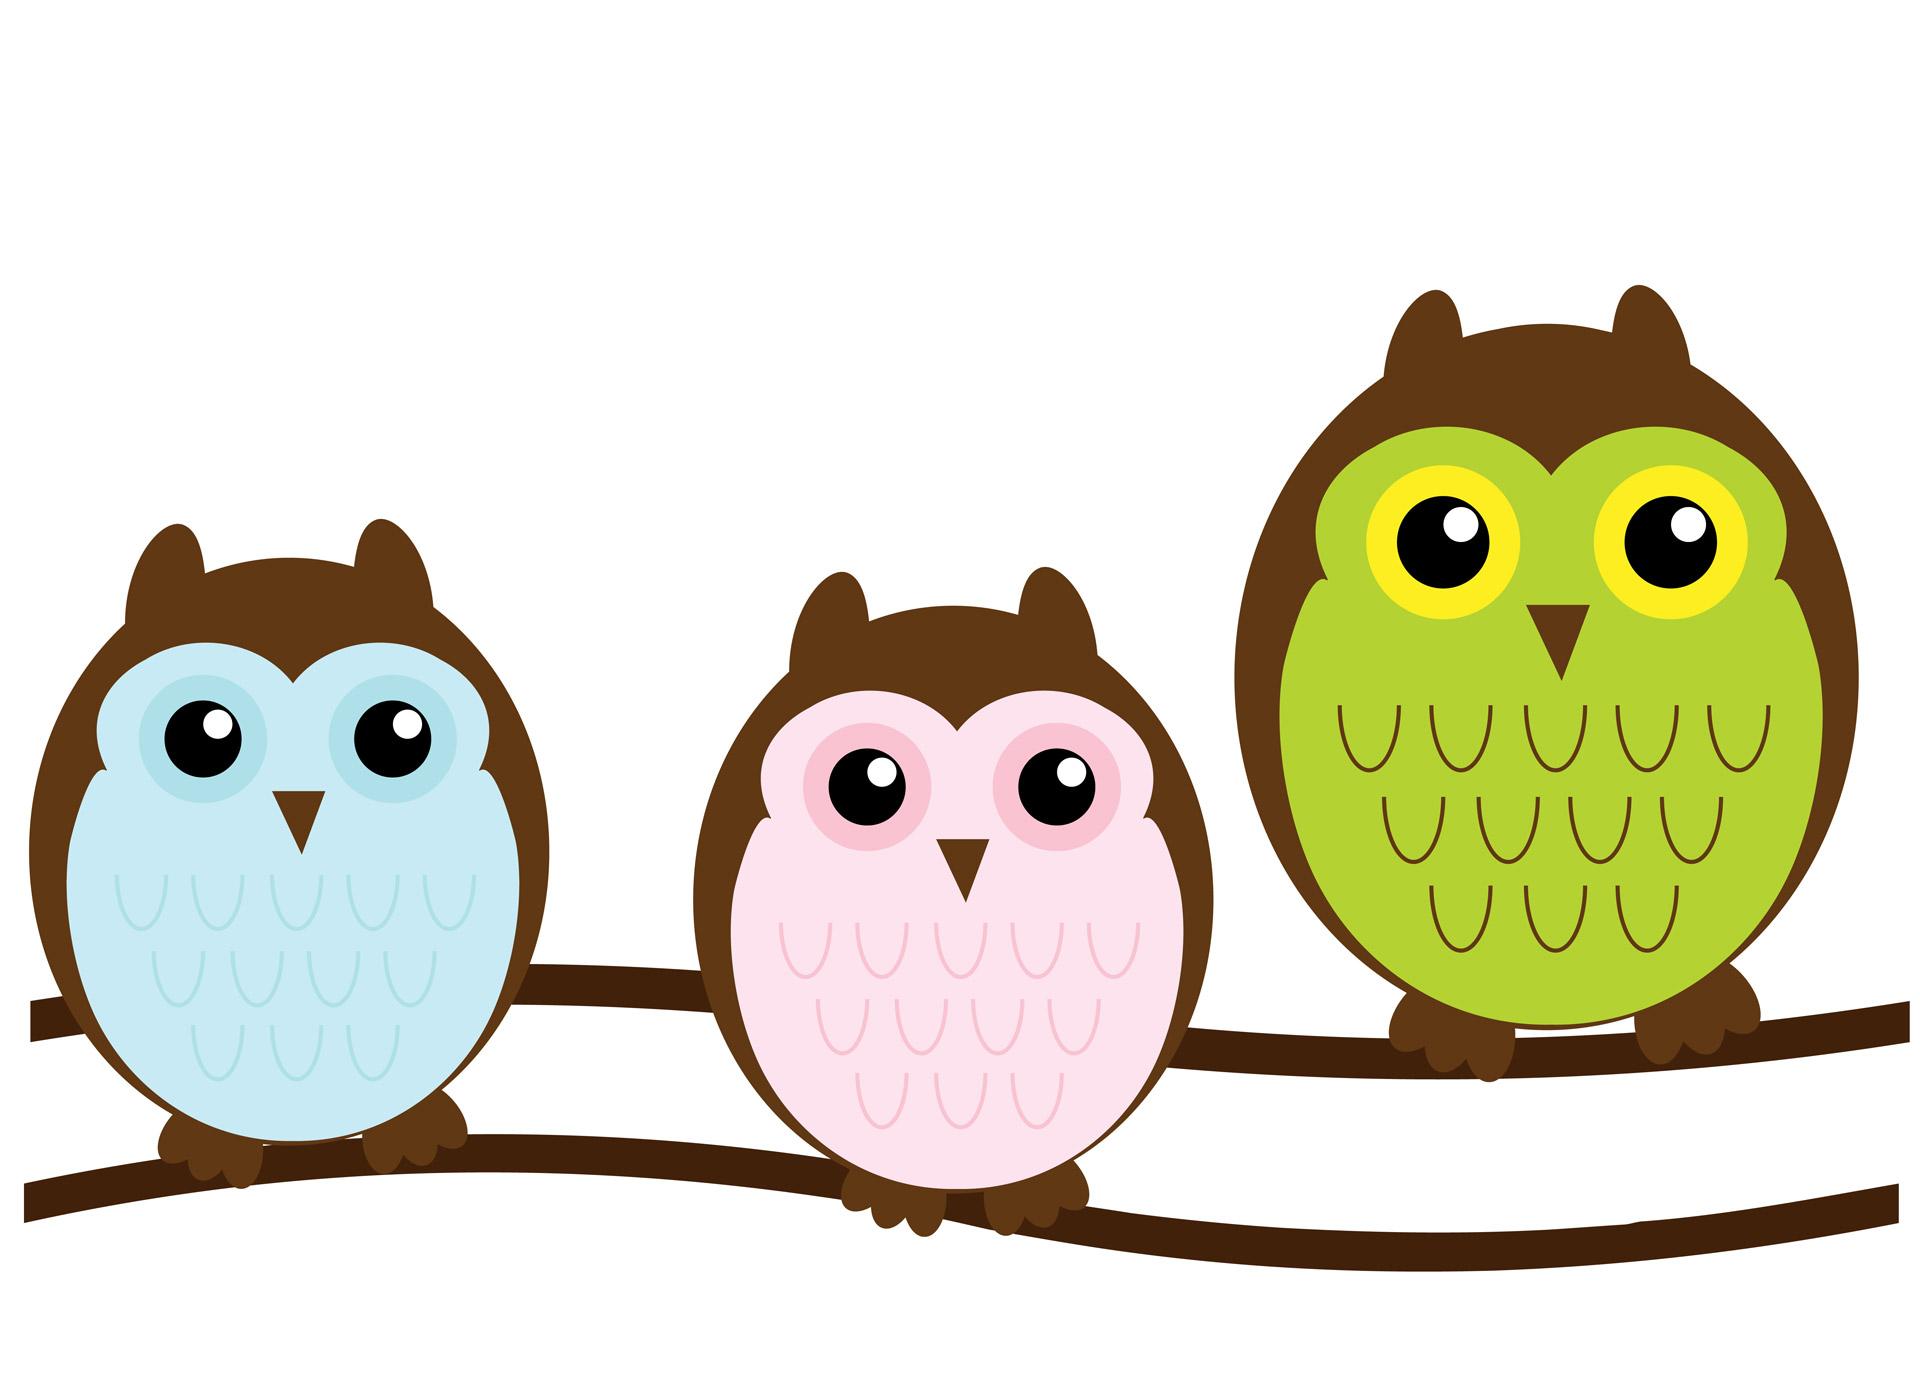 ... Owl Family Cute Clipart ...-... Owl Family Cute Clipart ...-18